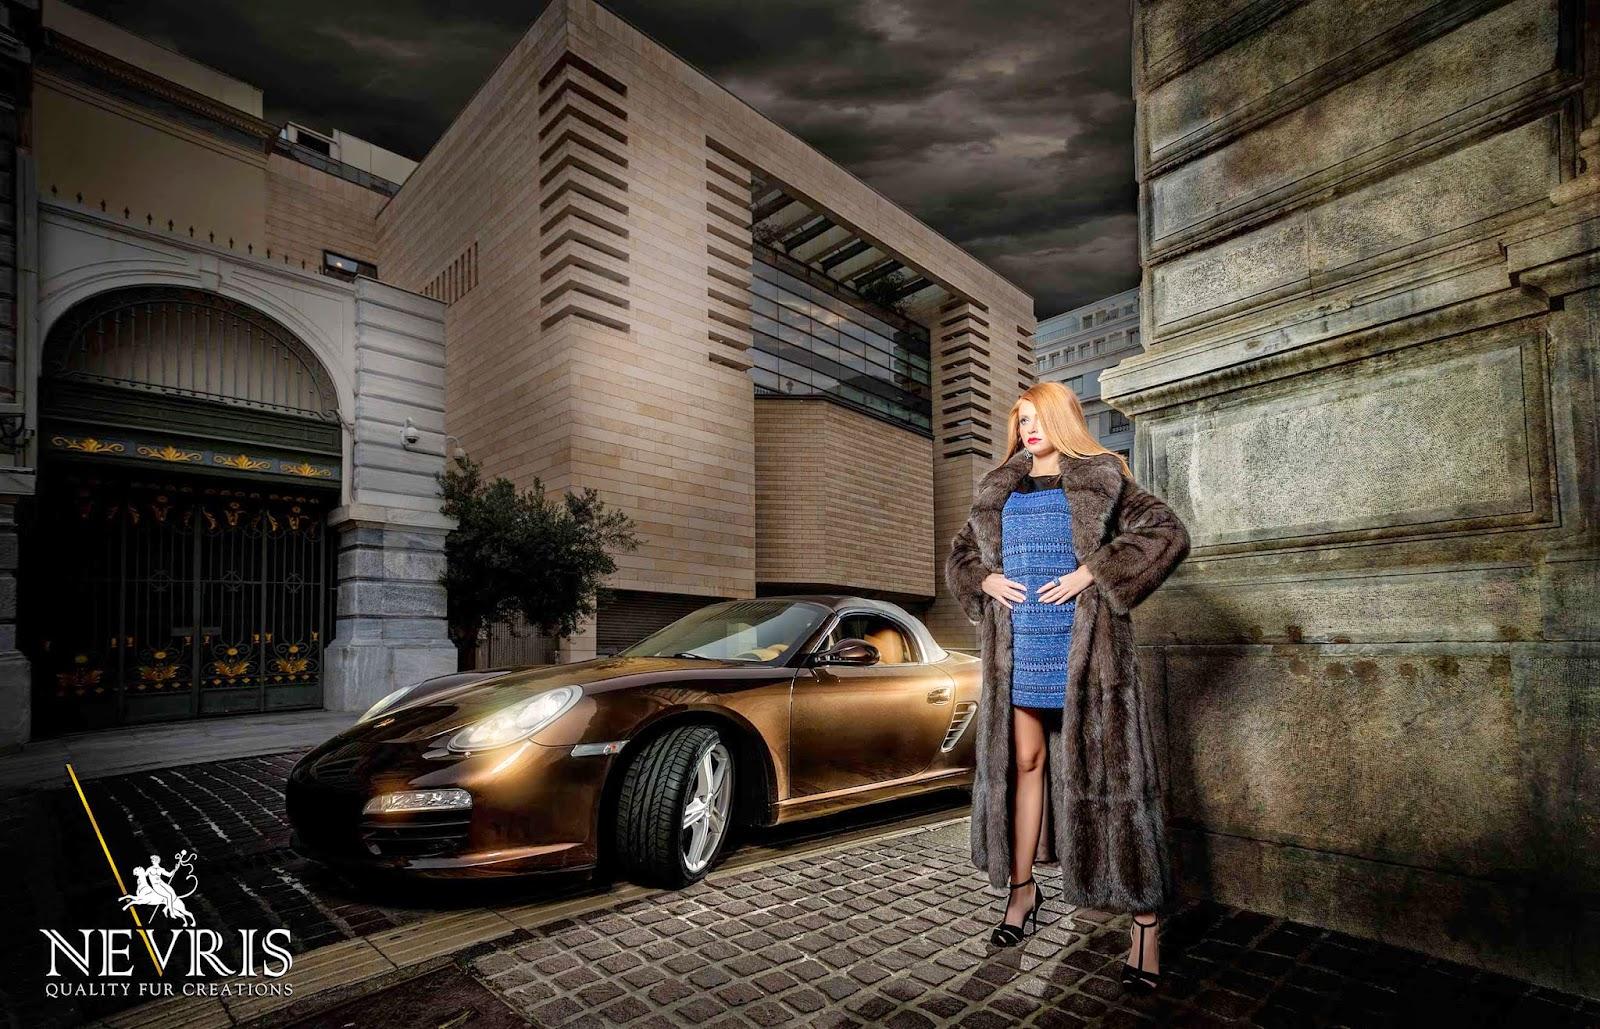 NEVRIS Collection 2015-2016 Lady Bond - Η Καμπάνια ολοκληρώνεται με φωτογράφιση από την StarSystem pro